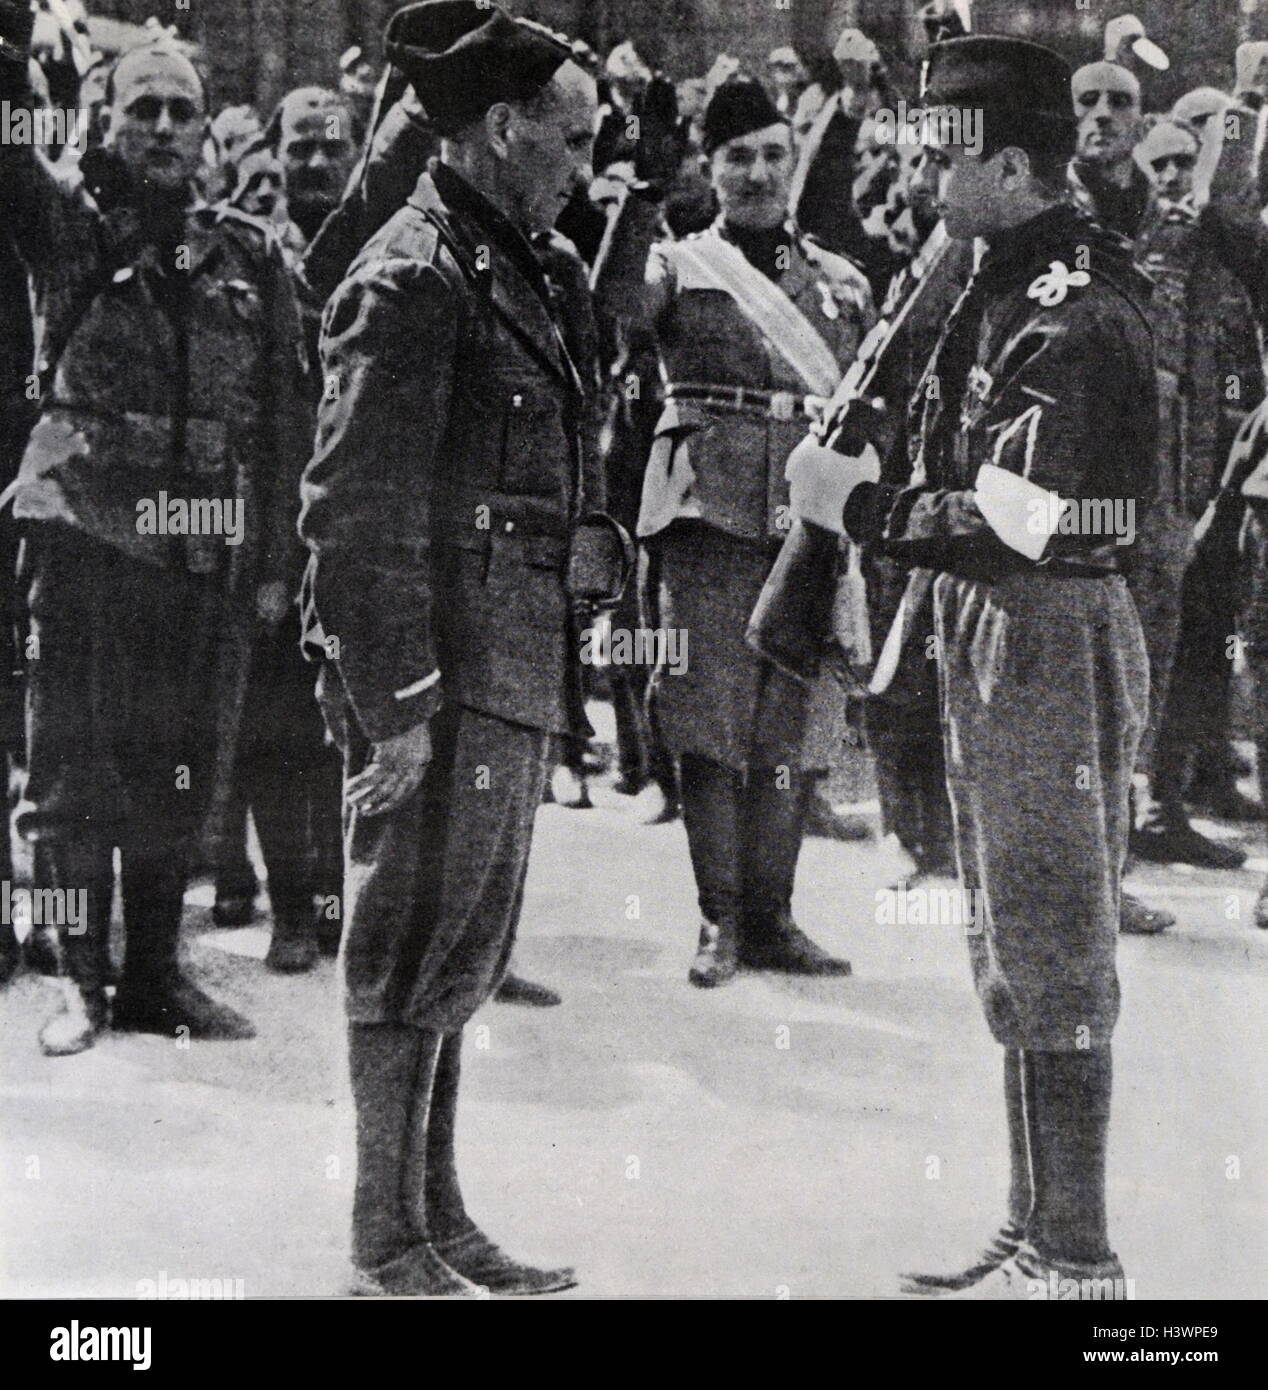 Graduation ceremony for an Italian Fascist militia soldier 1938 - Stock Image